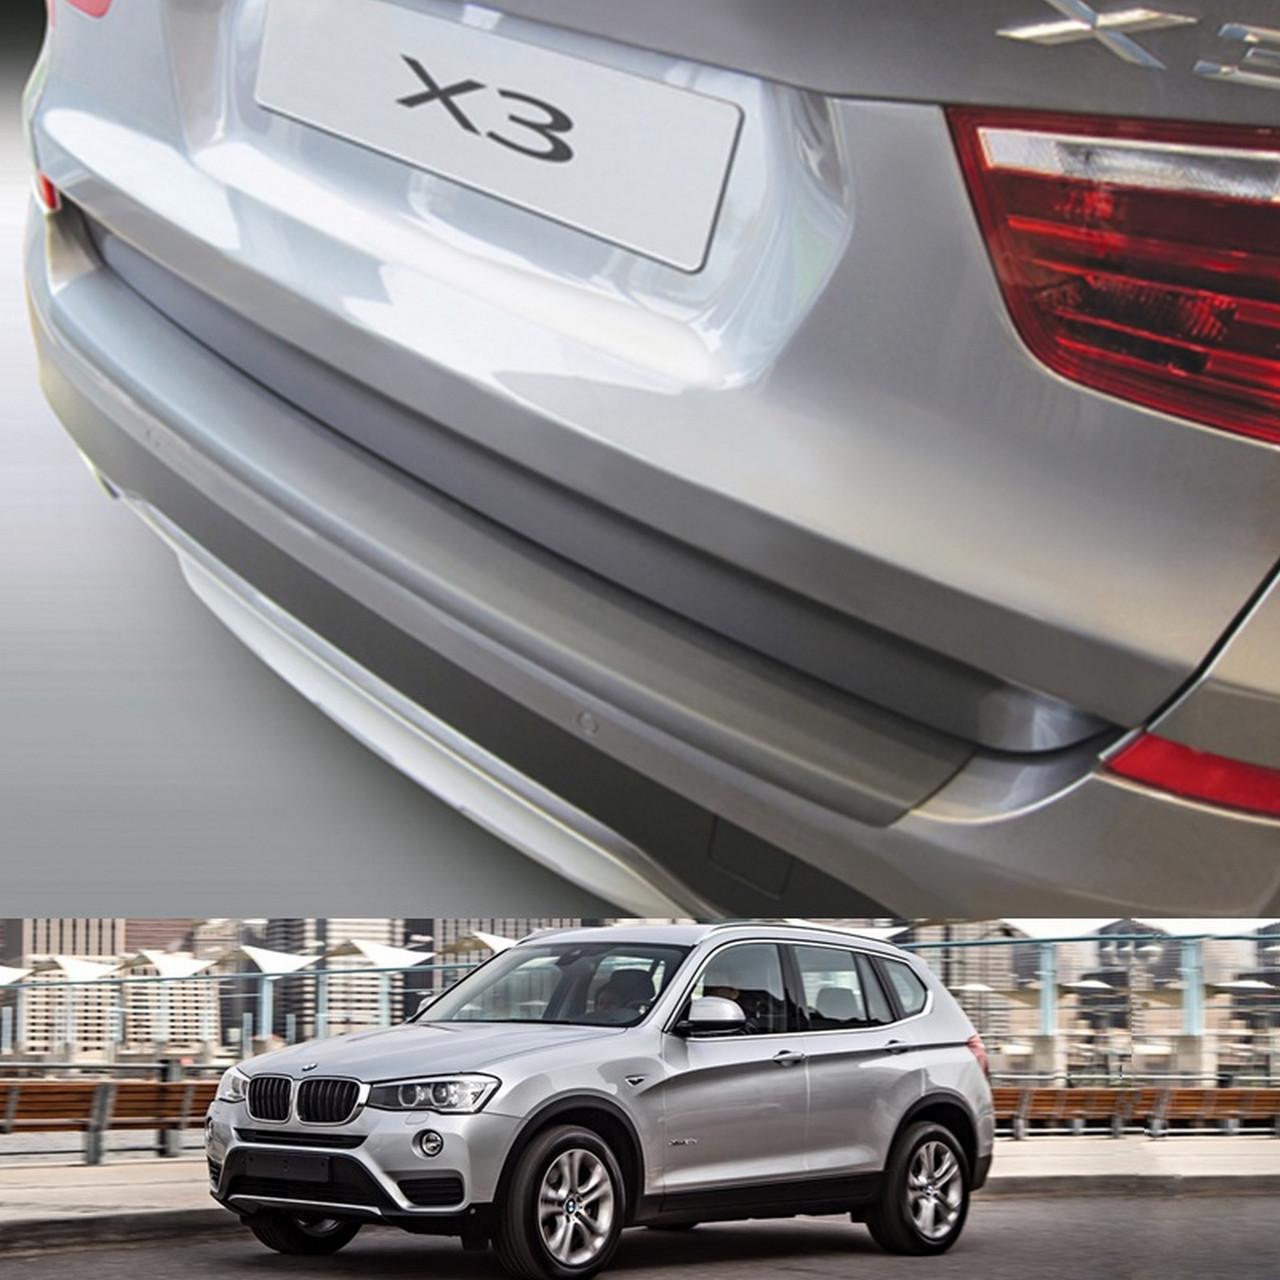 BMW X3 F25 2014-2017 пластиковая накладка заднего бампера